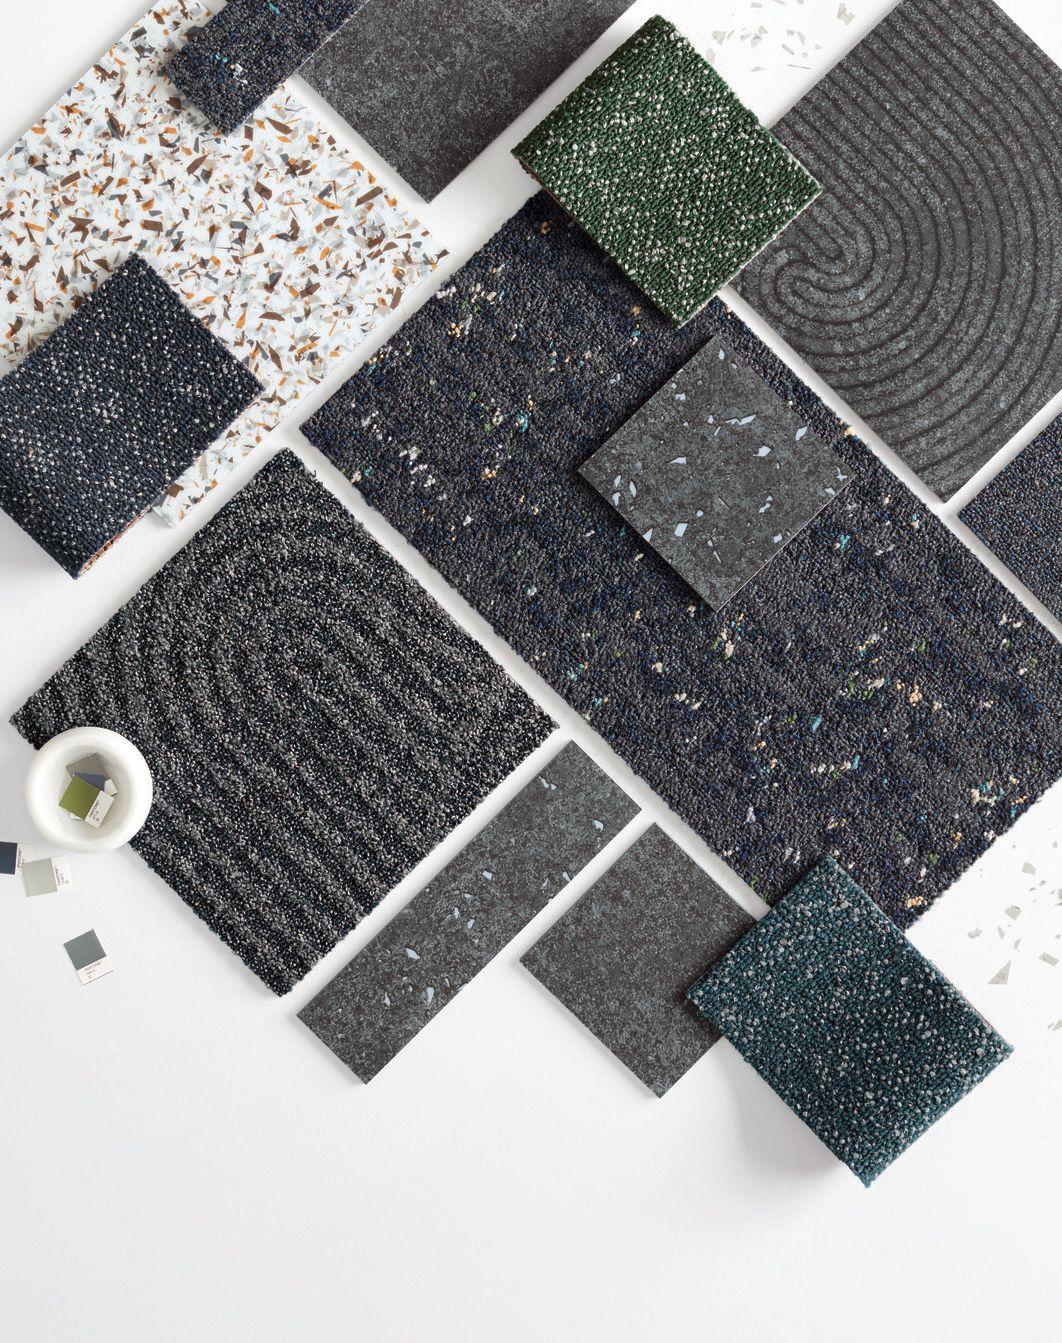 Material Palette Featuring Look Both Ways Carpet Tiles Exterior Tiles Carpet Tiles Design